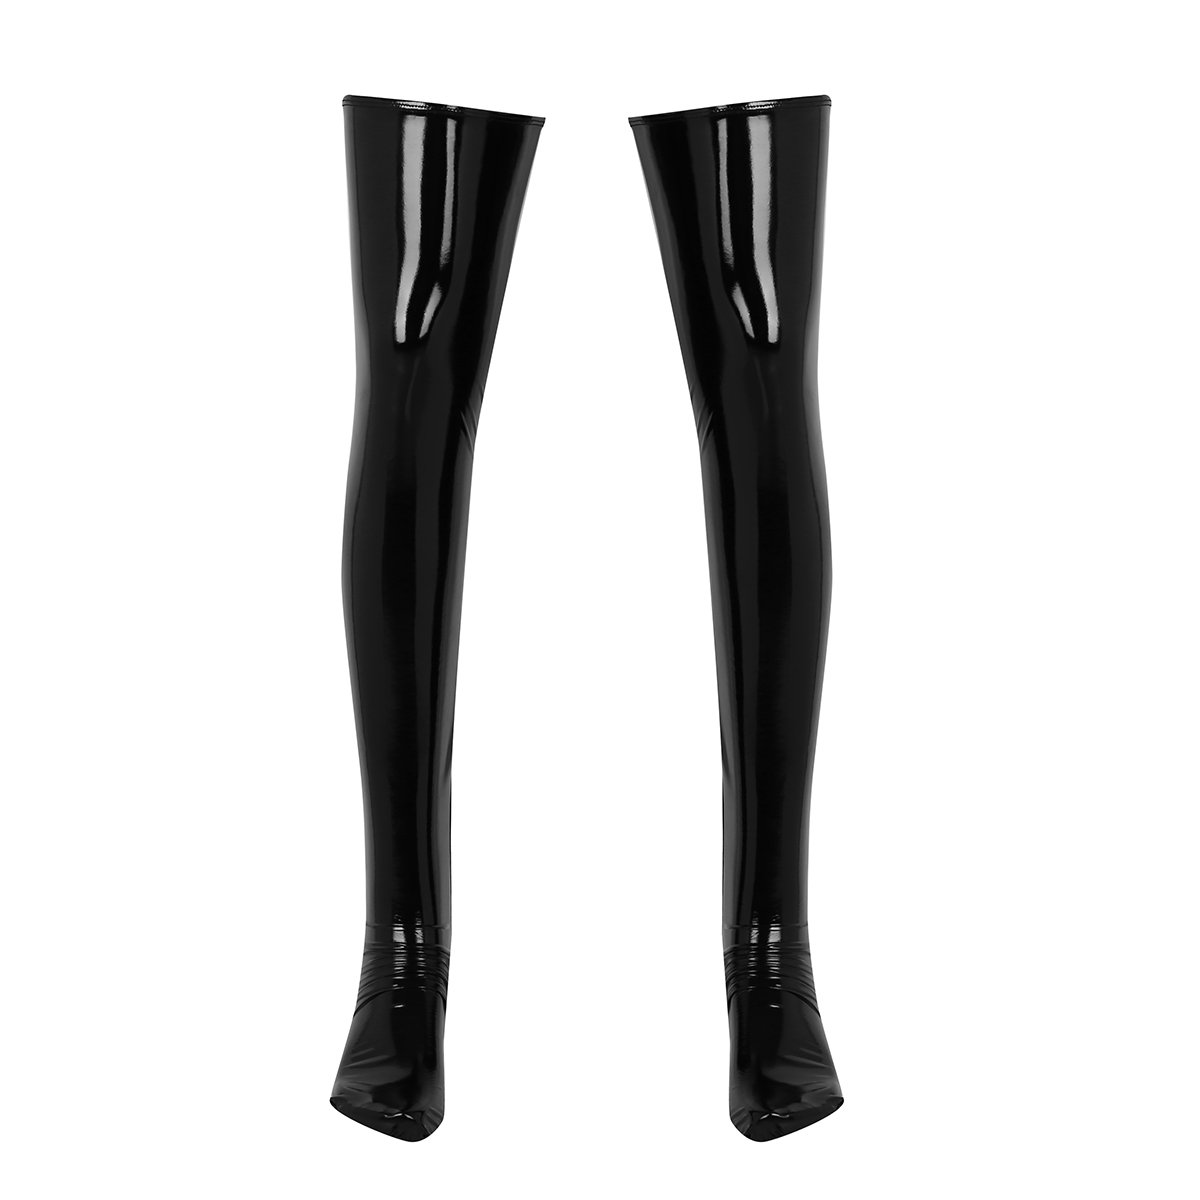 Alvivi Men's Wet Look Faux Leather Thigh High